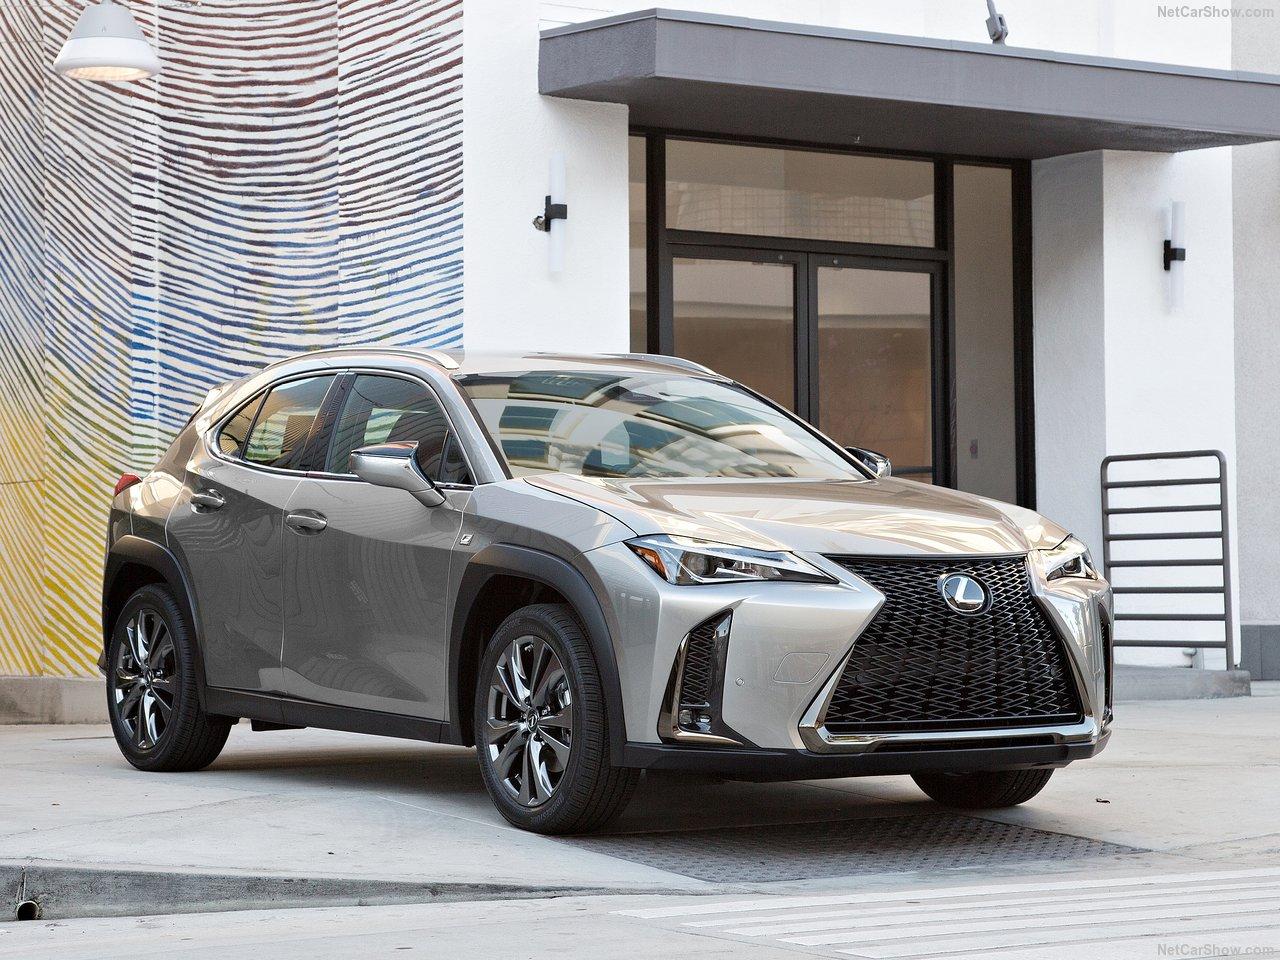 Lexus-UX-2019-1280-04.jpg